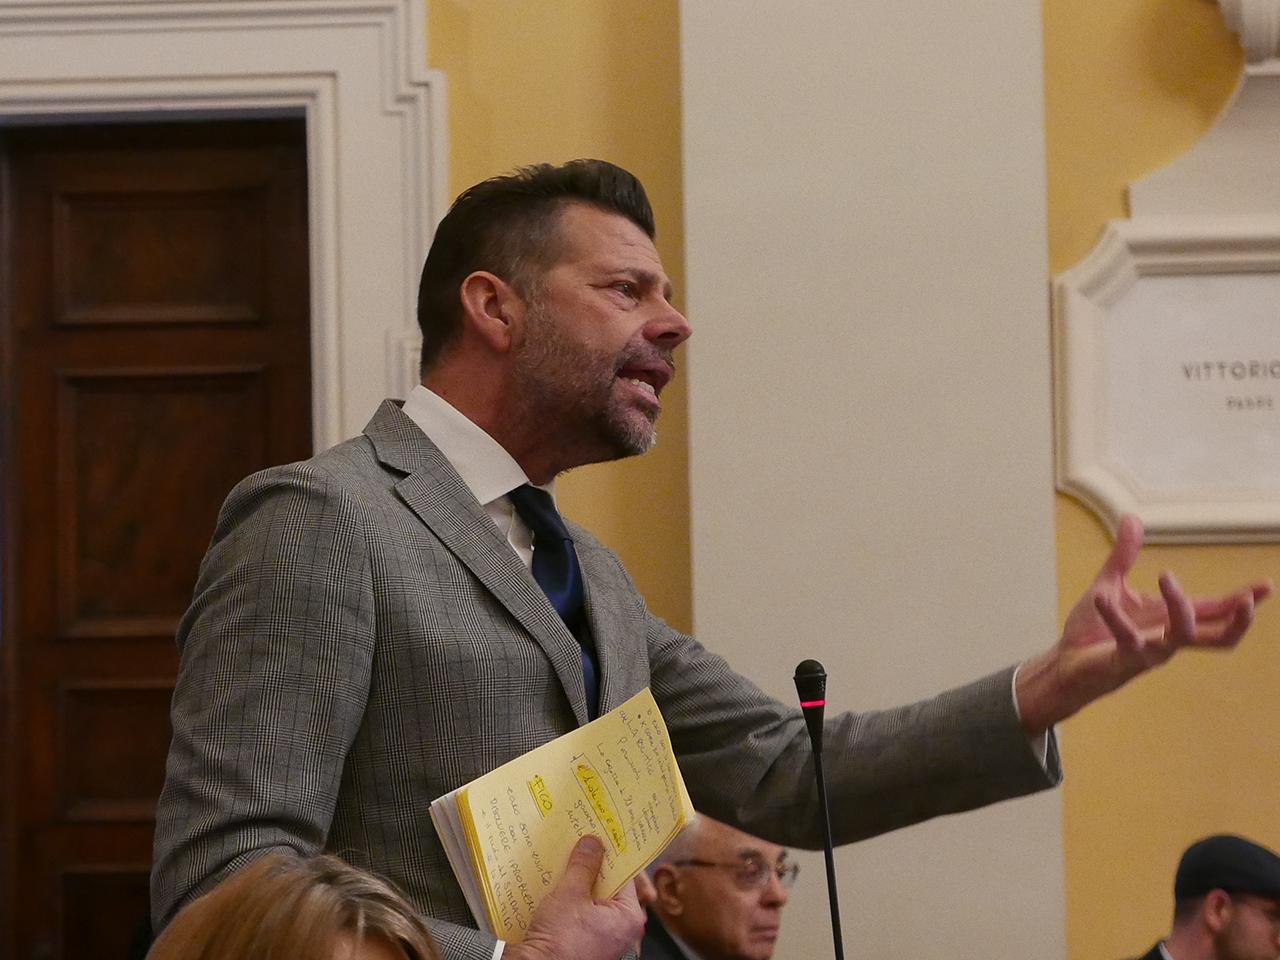 L'intervento del sindaco Mangialardi